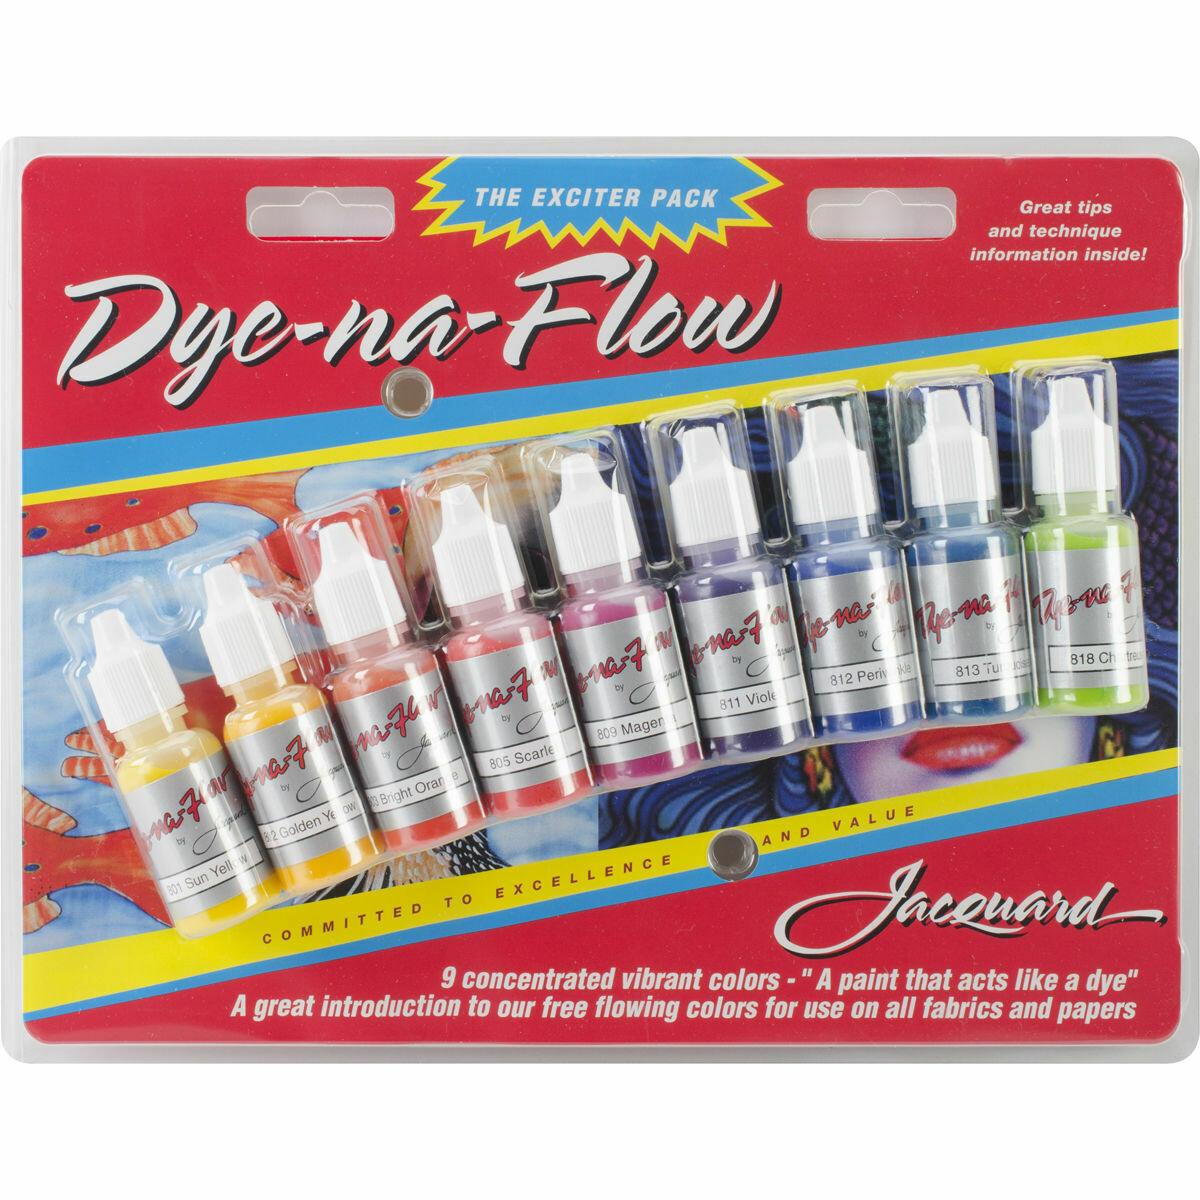 Jacquard Dye-na-Flow Exciter Pack